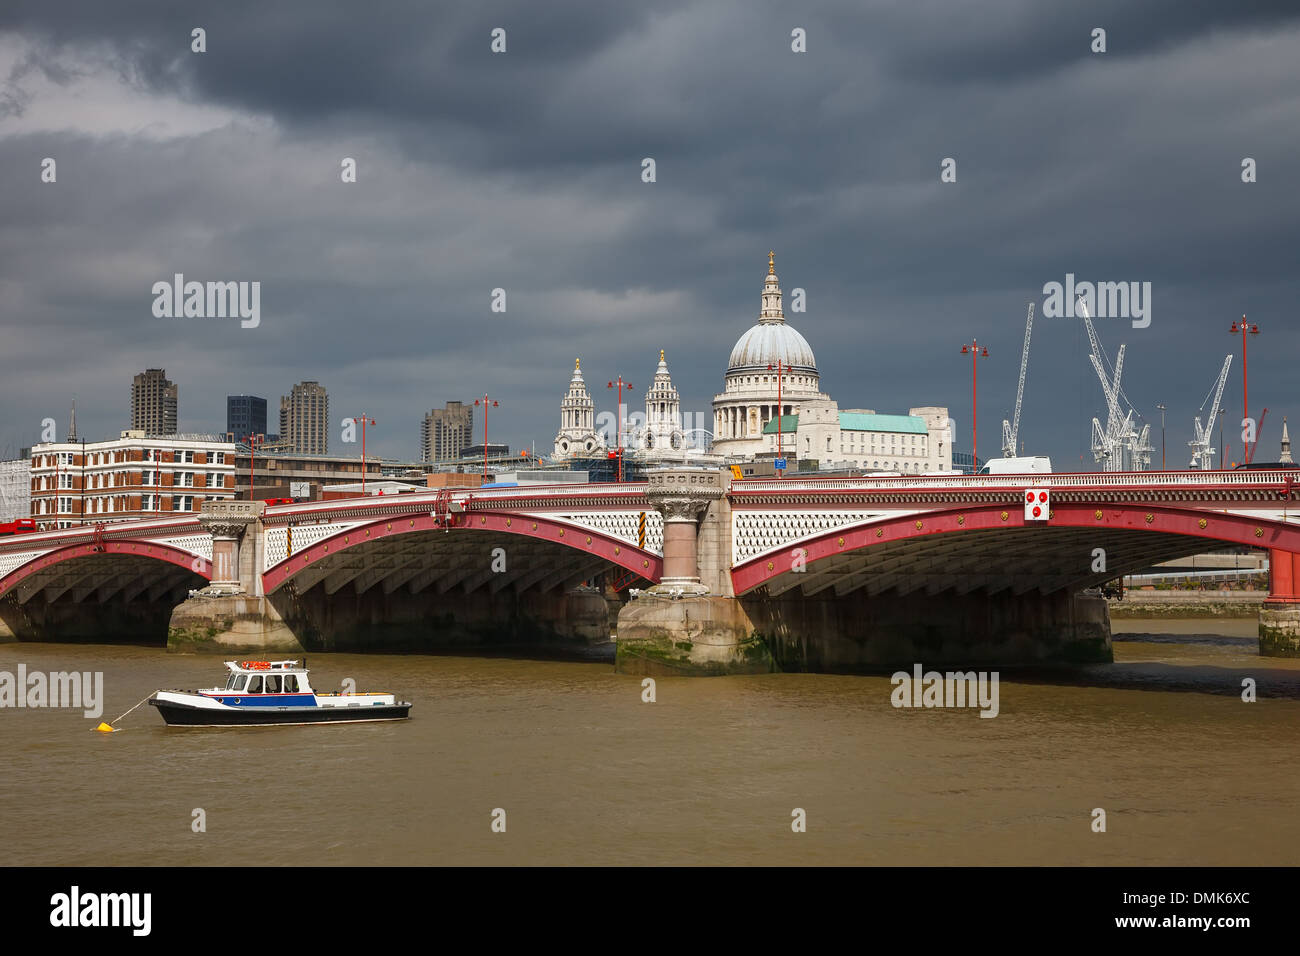 Die Blackfriars Bridge, London Stockfoto